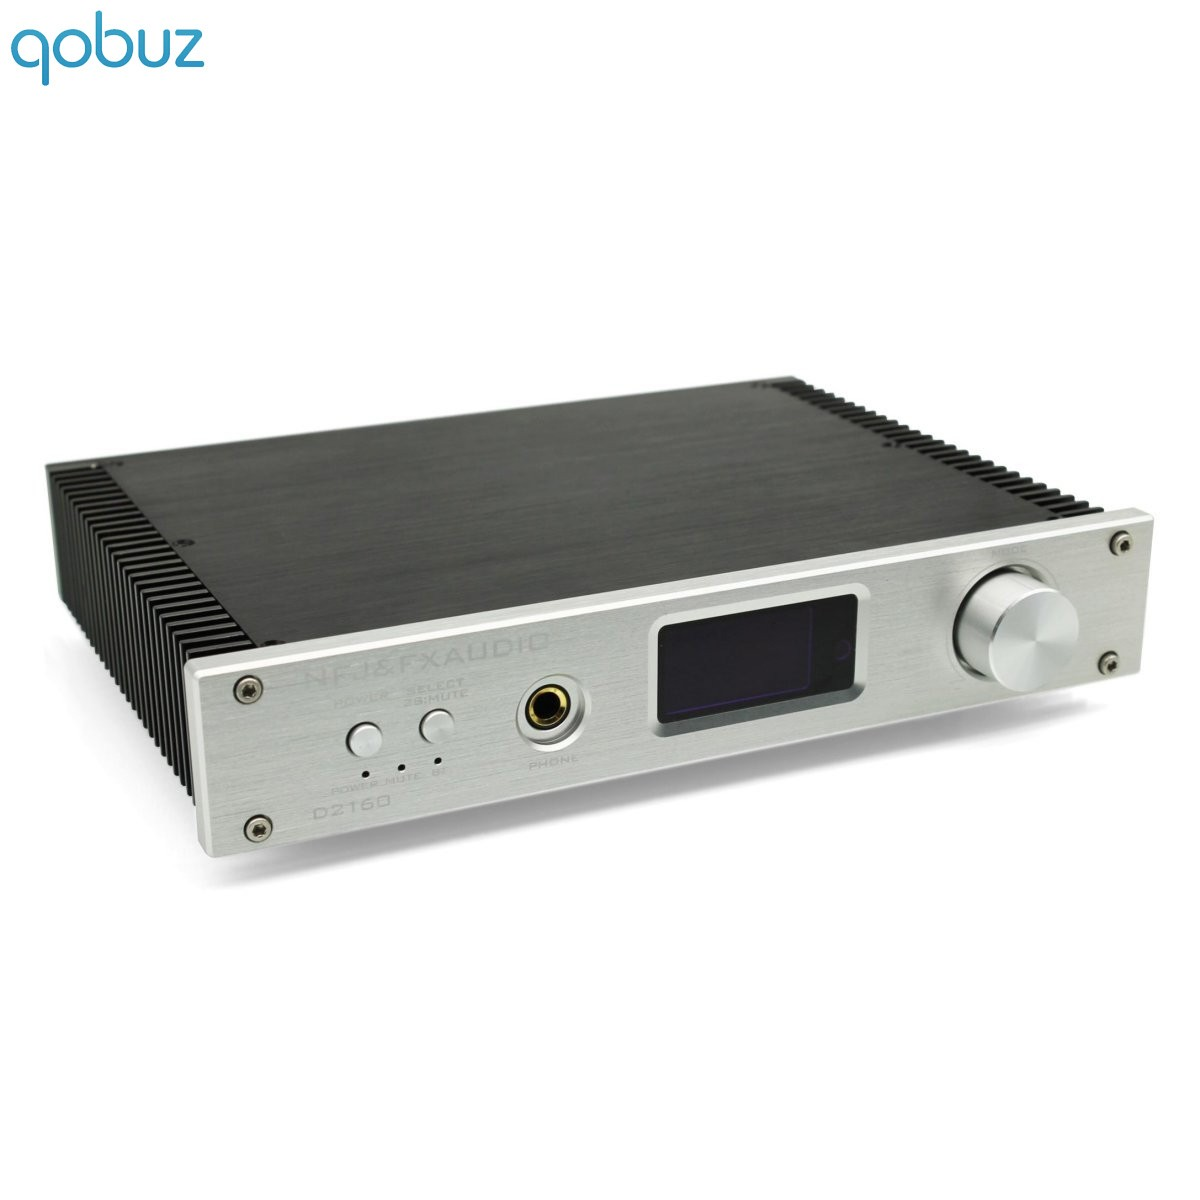 FX-AUDIO D2160 FDA Amplifier Bluetooth 4.2 TAS5614 2x65W 8 Ohms Silver